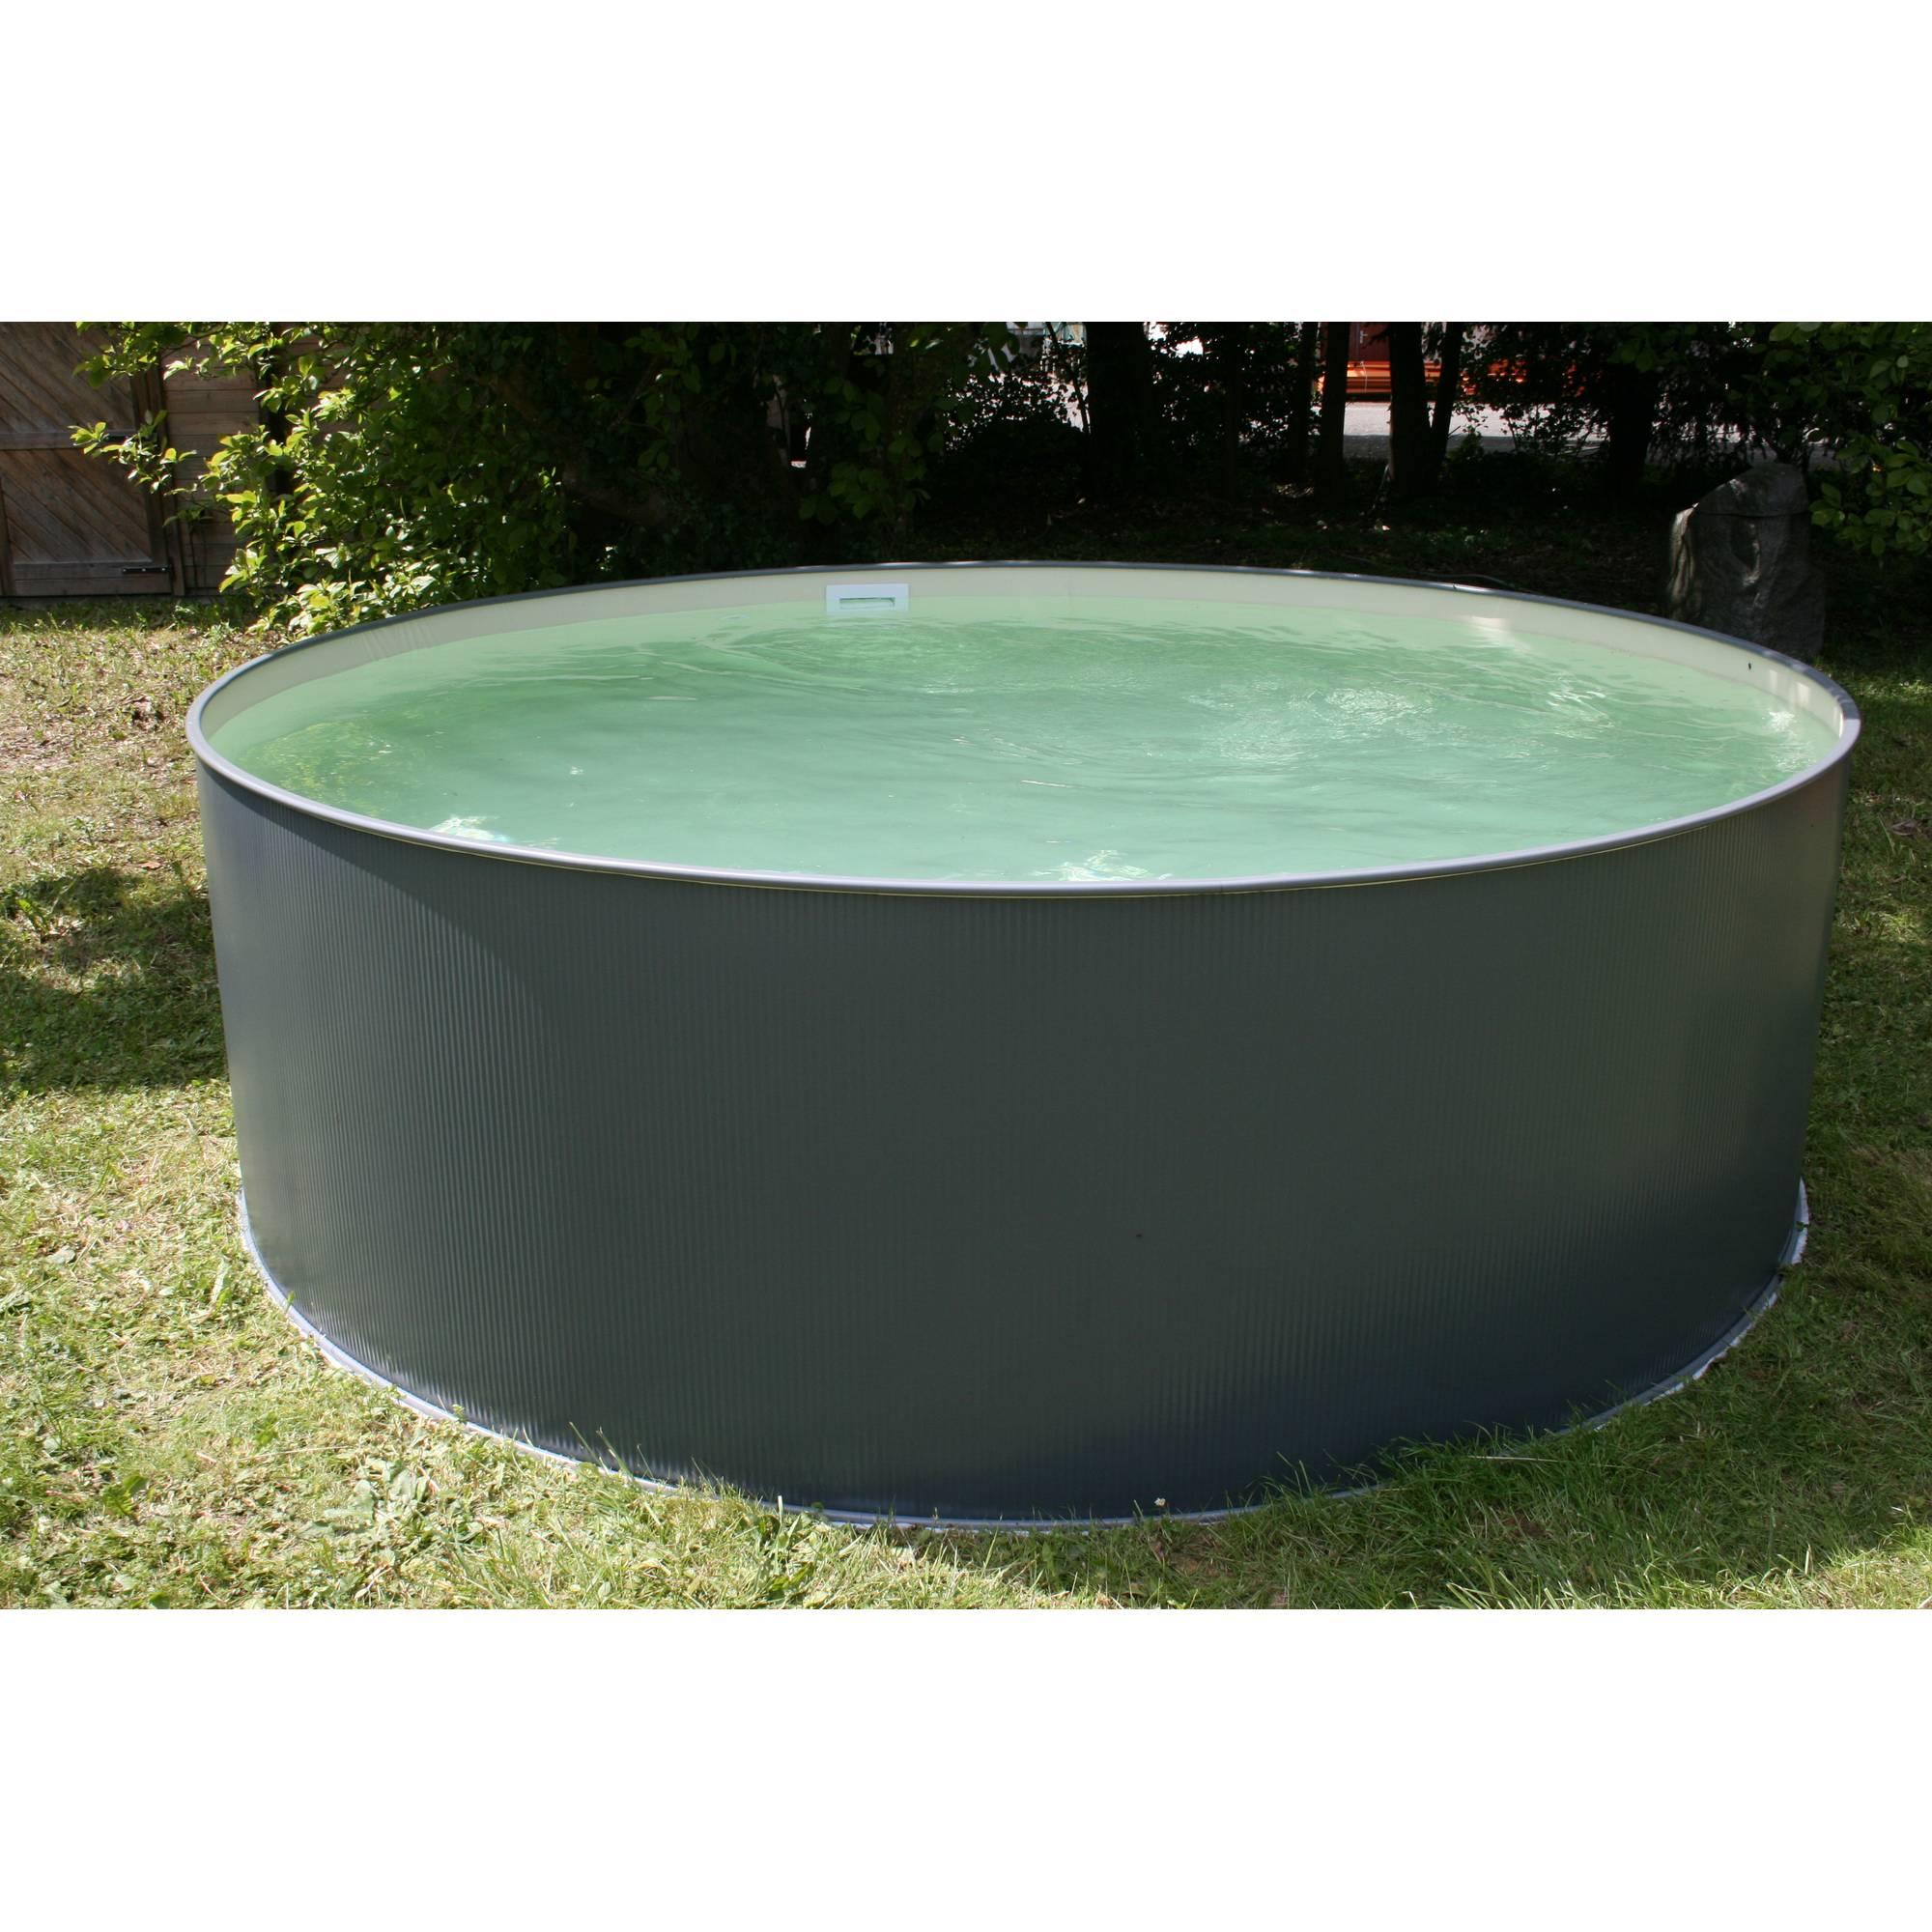 Stahlwandpool rundform anthrazit 350x90 cm, Innenhülle sandfarben, overlap